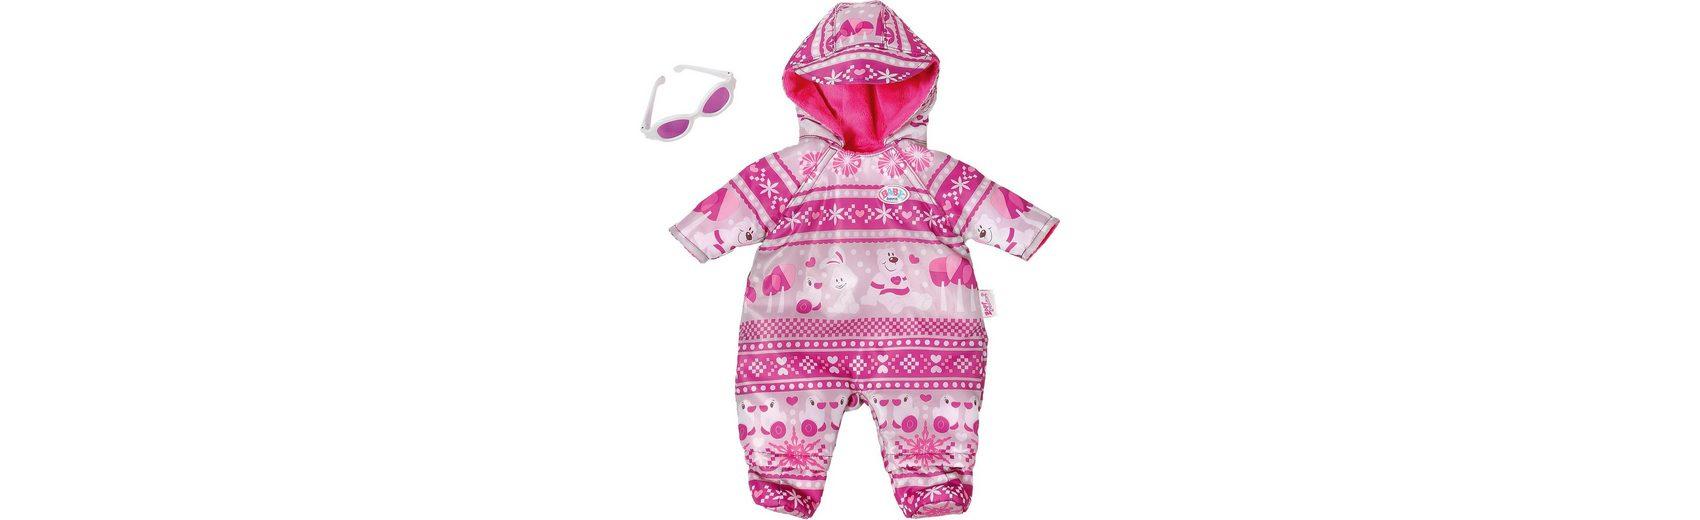 Zapf Creation BABY born® Deluxe Puppenkleidung Schnee Set